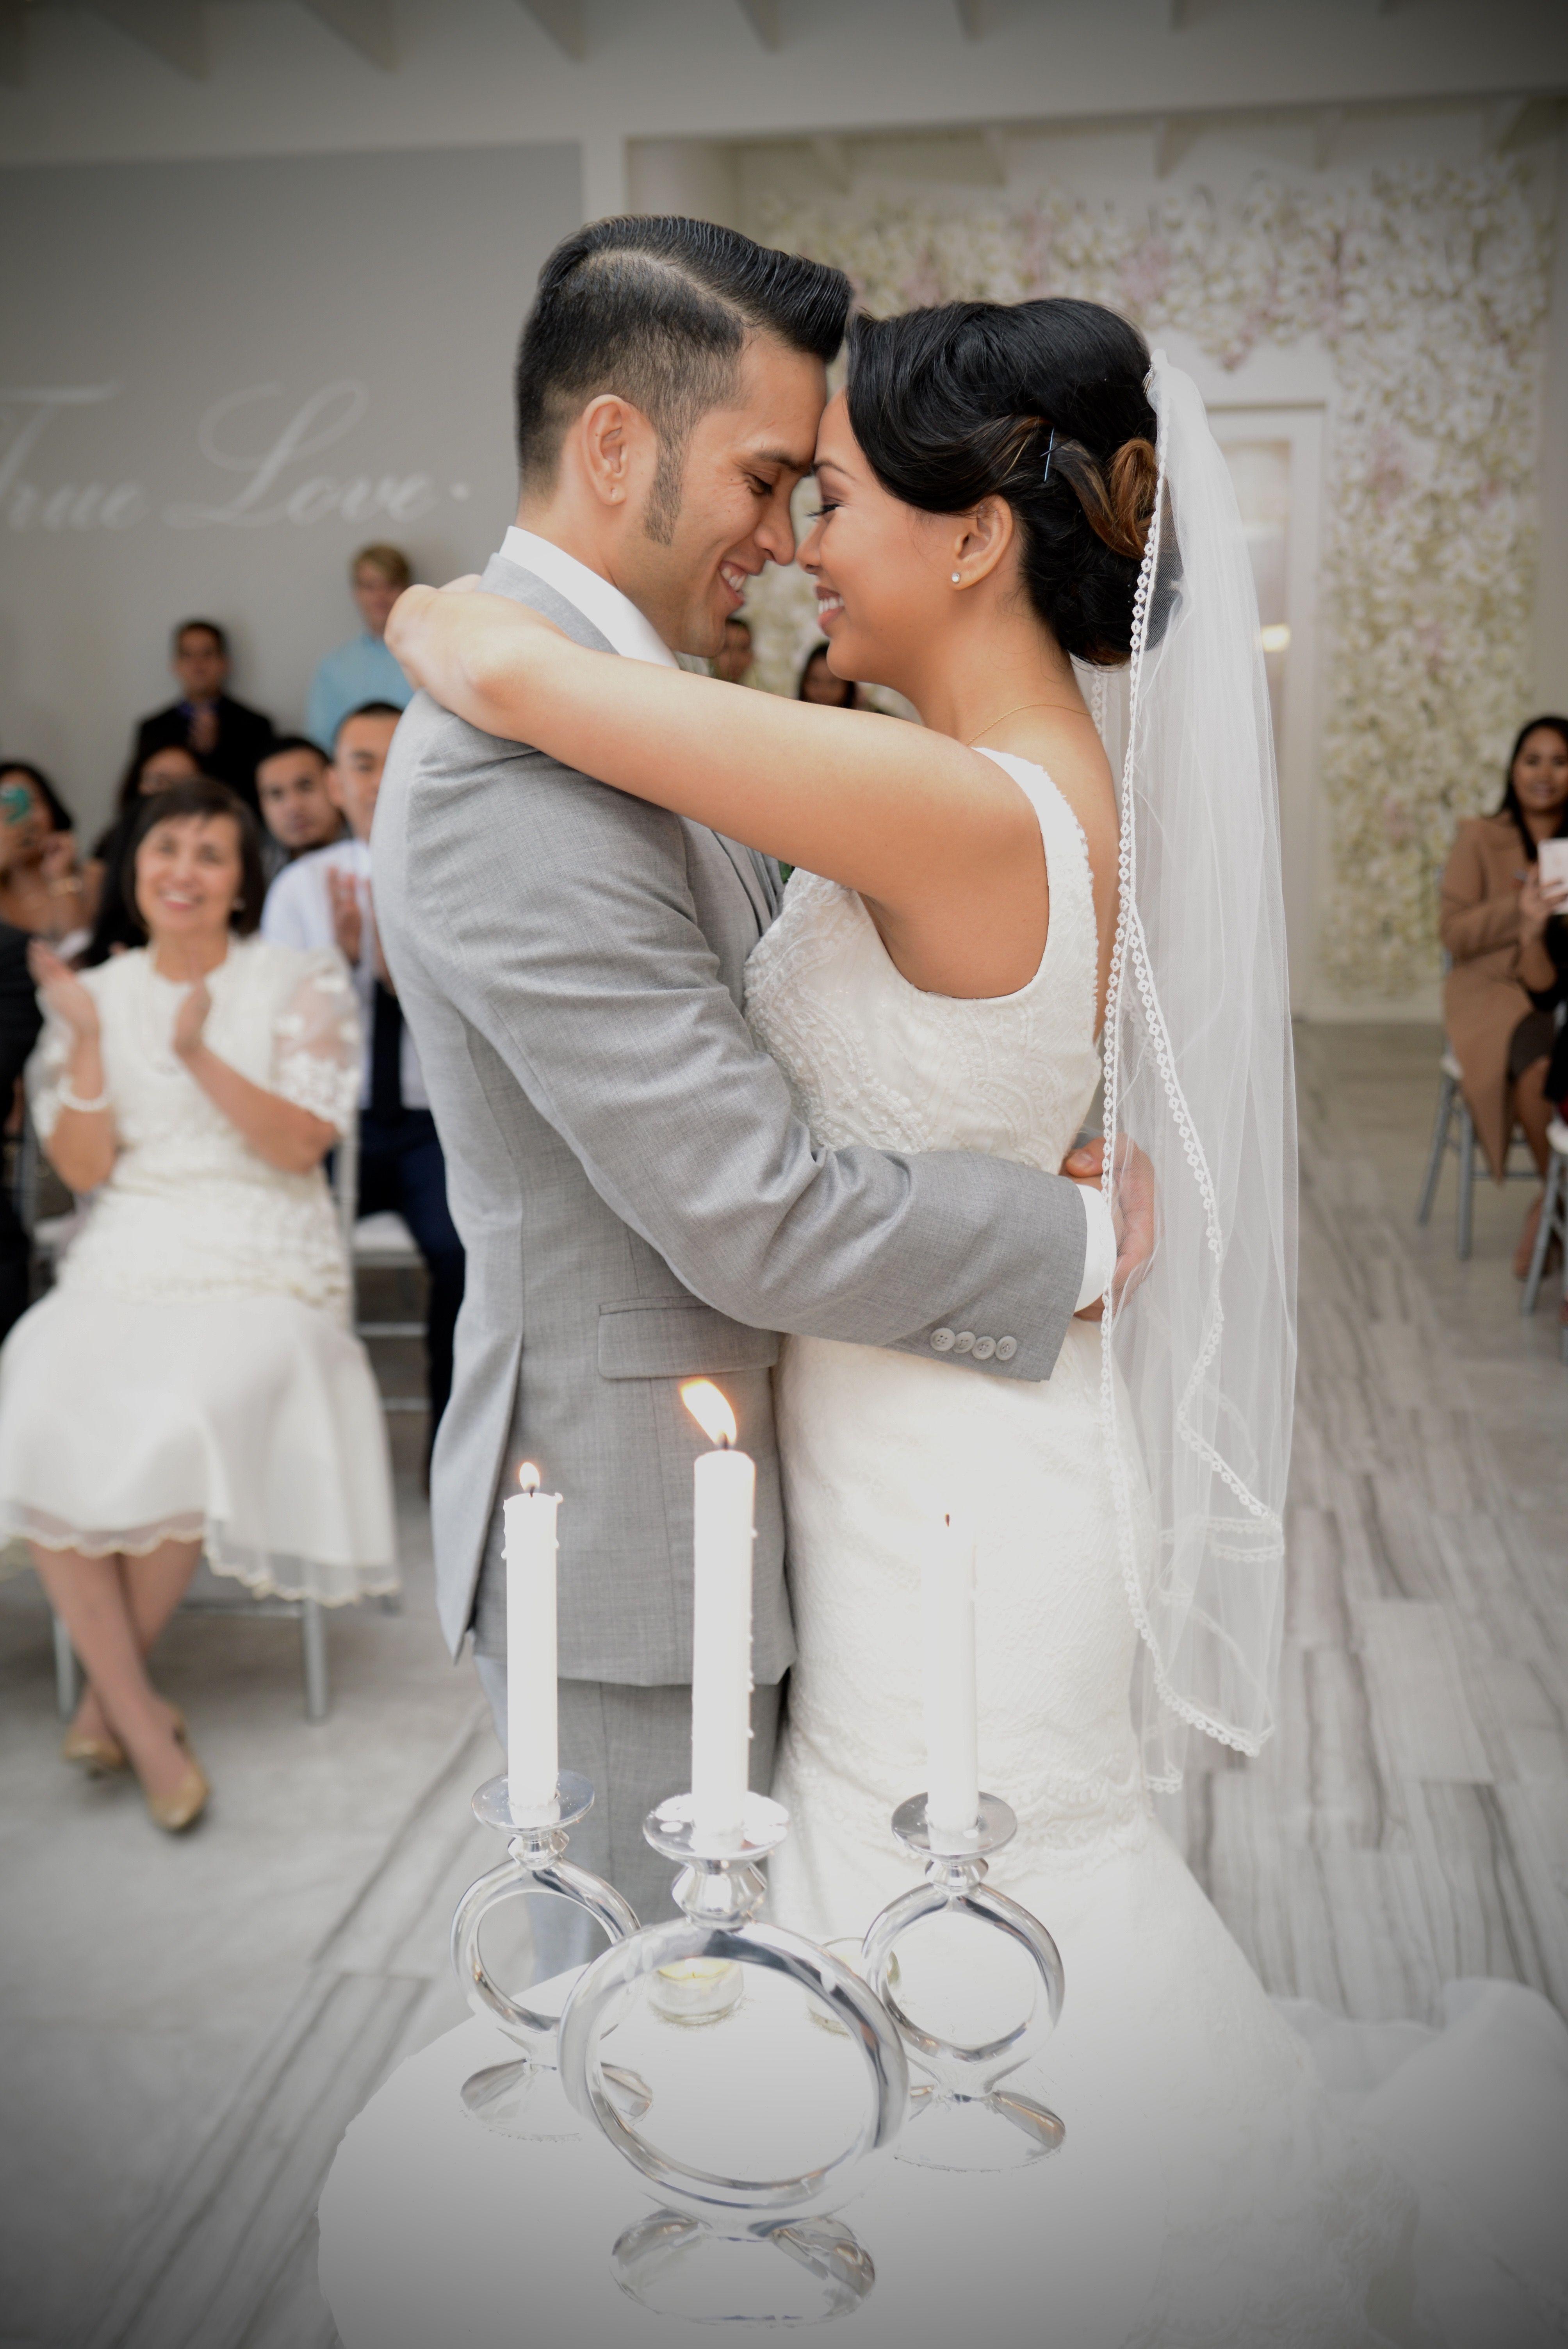 True Love At Albertson Wedding Chapel Chapel Wedding Intimate Weddings Wedding